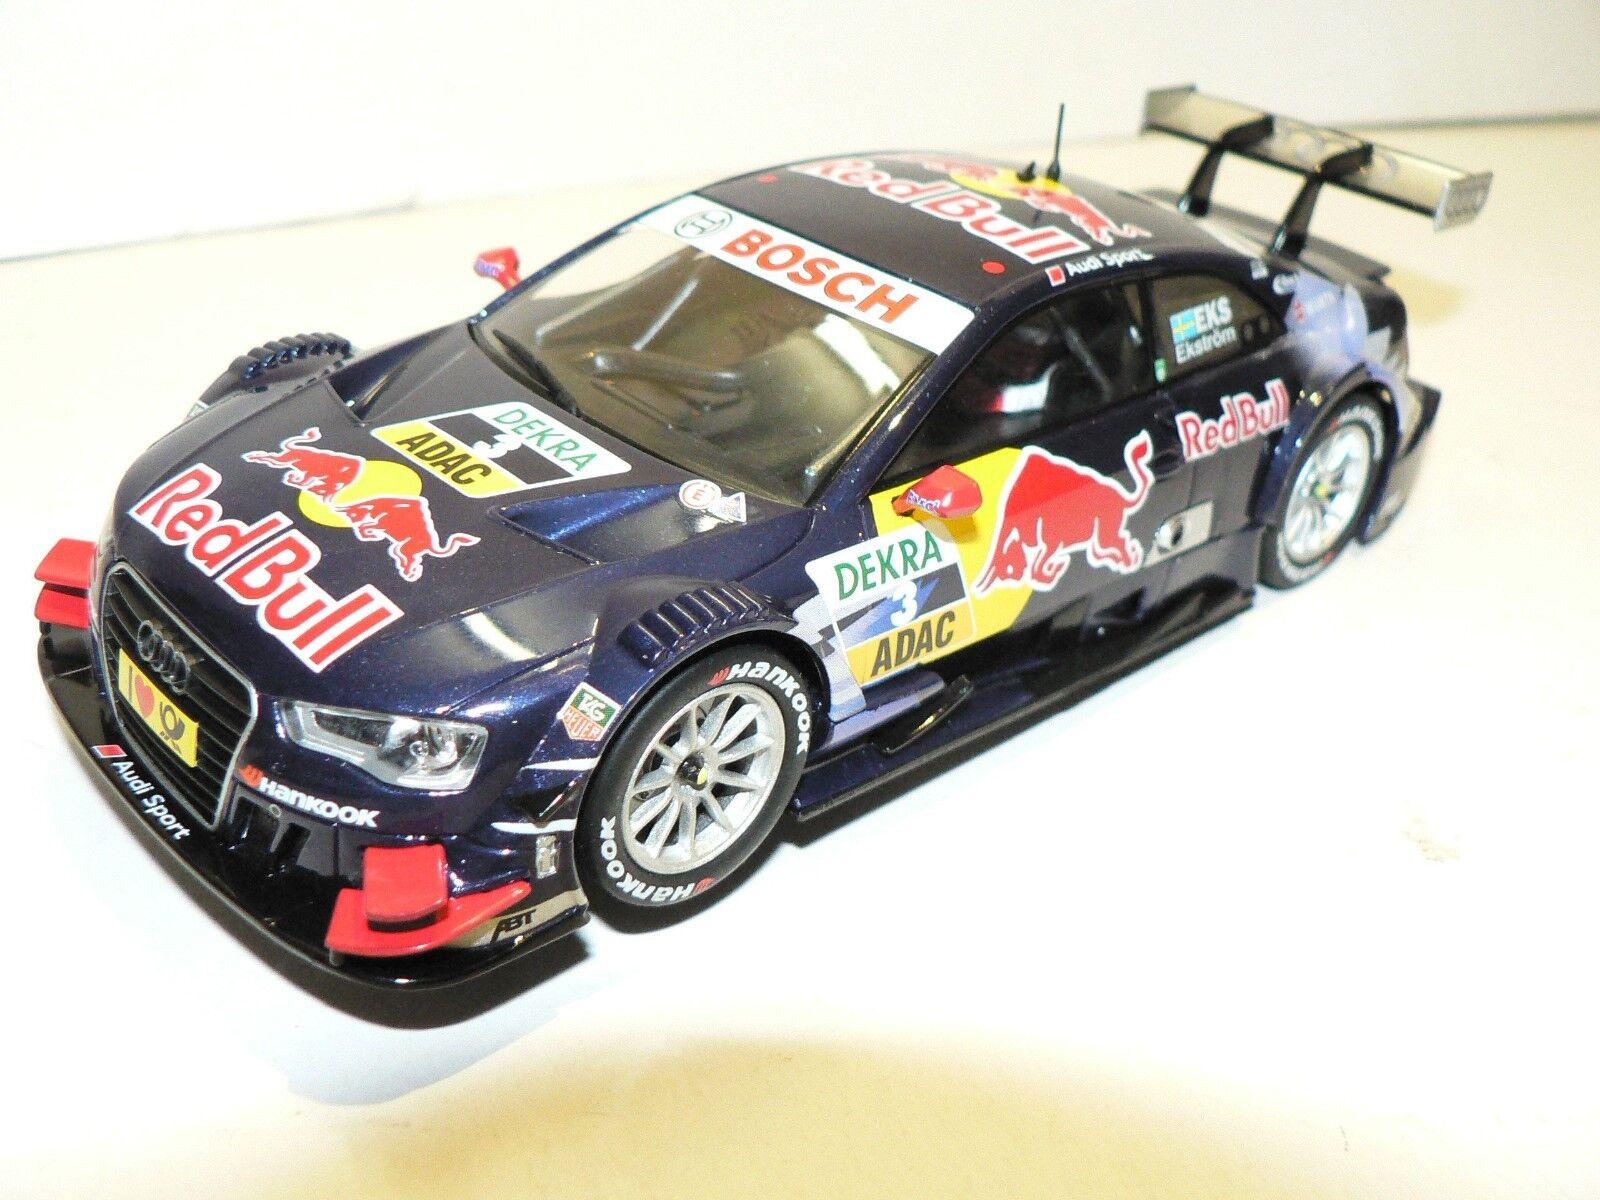 nessun minimo autorera Digital 132 30657 Audi A5 A5 A5 DTM Toro Rosso M.Ekstrom  senza esitazione! acquista ora!